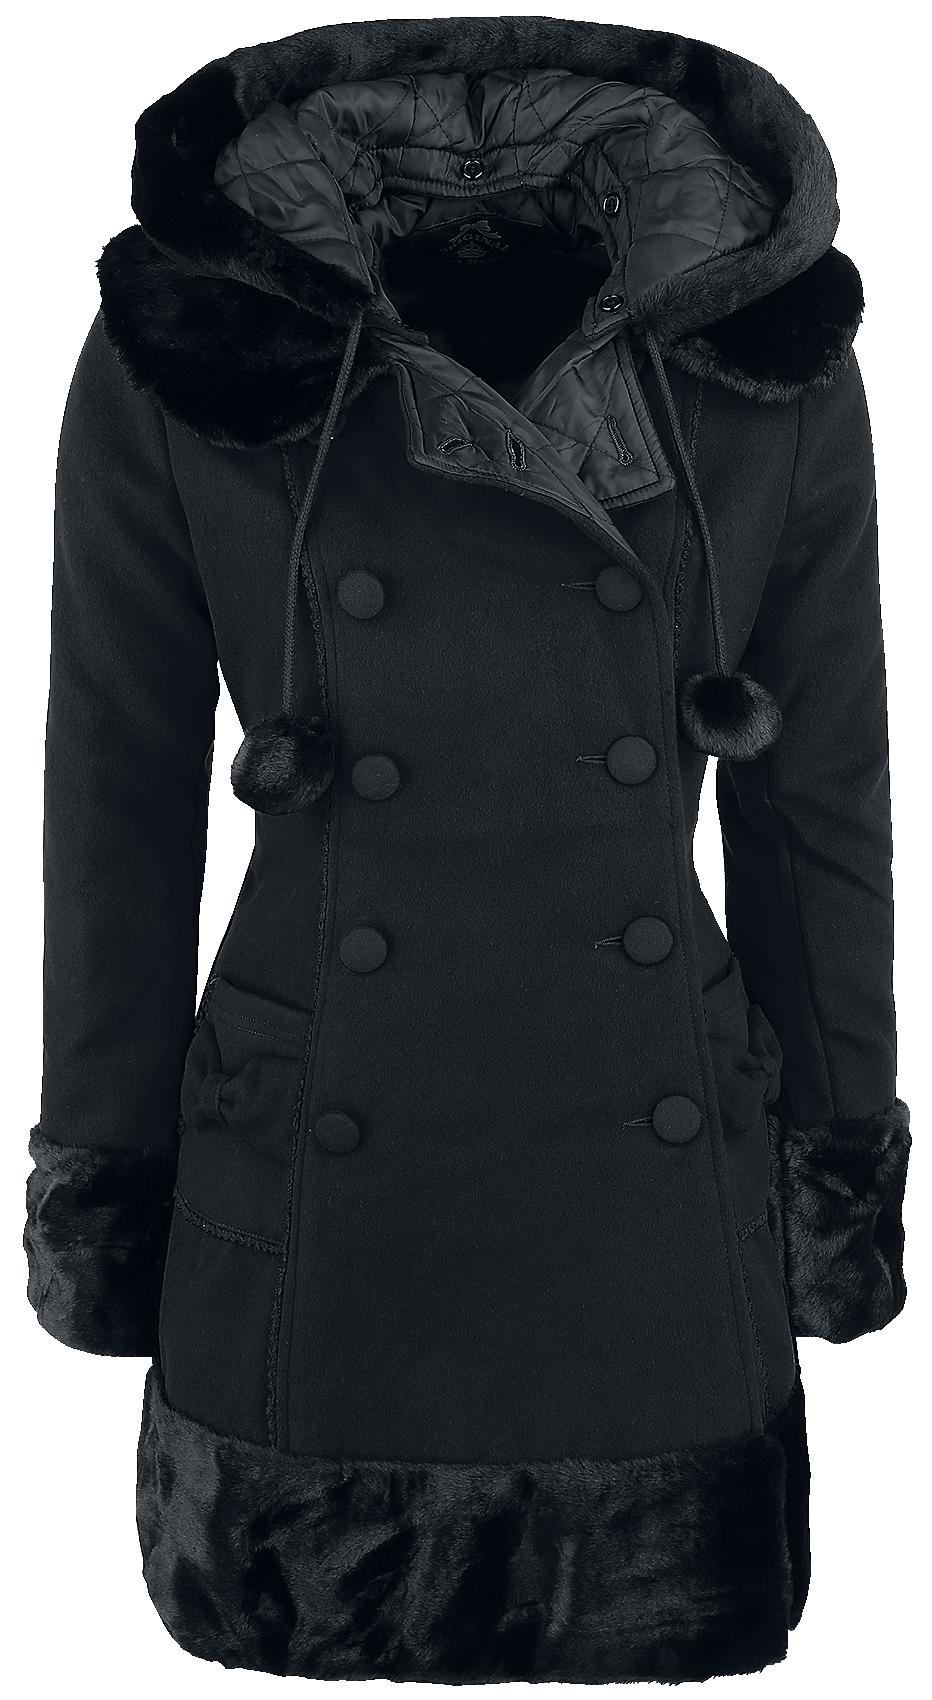 Hell Bunny - Sarah Jane Coat - Girls coat - black